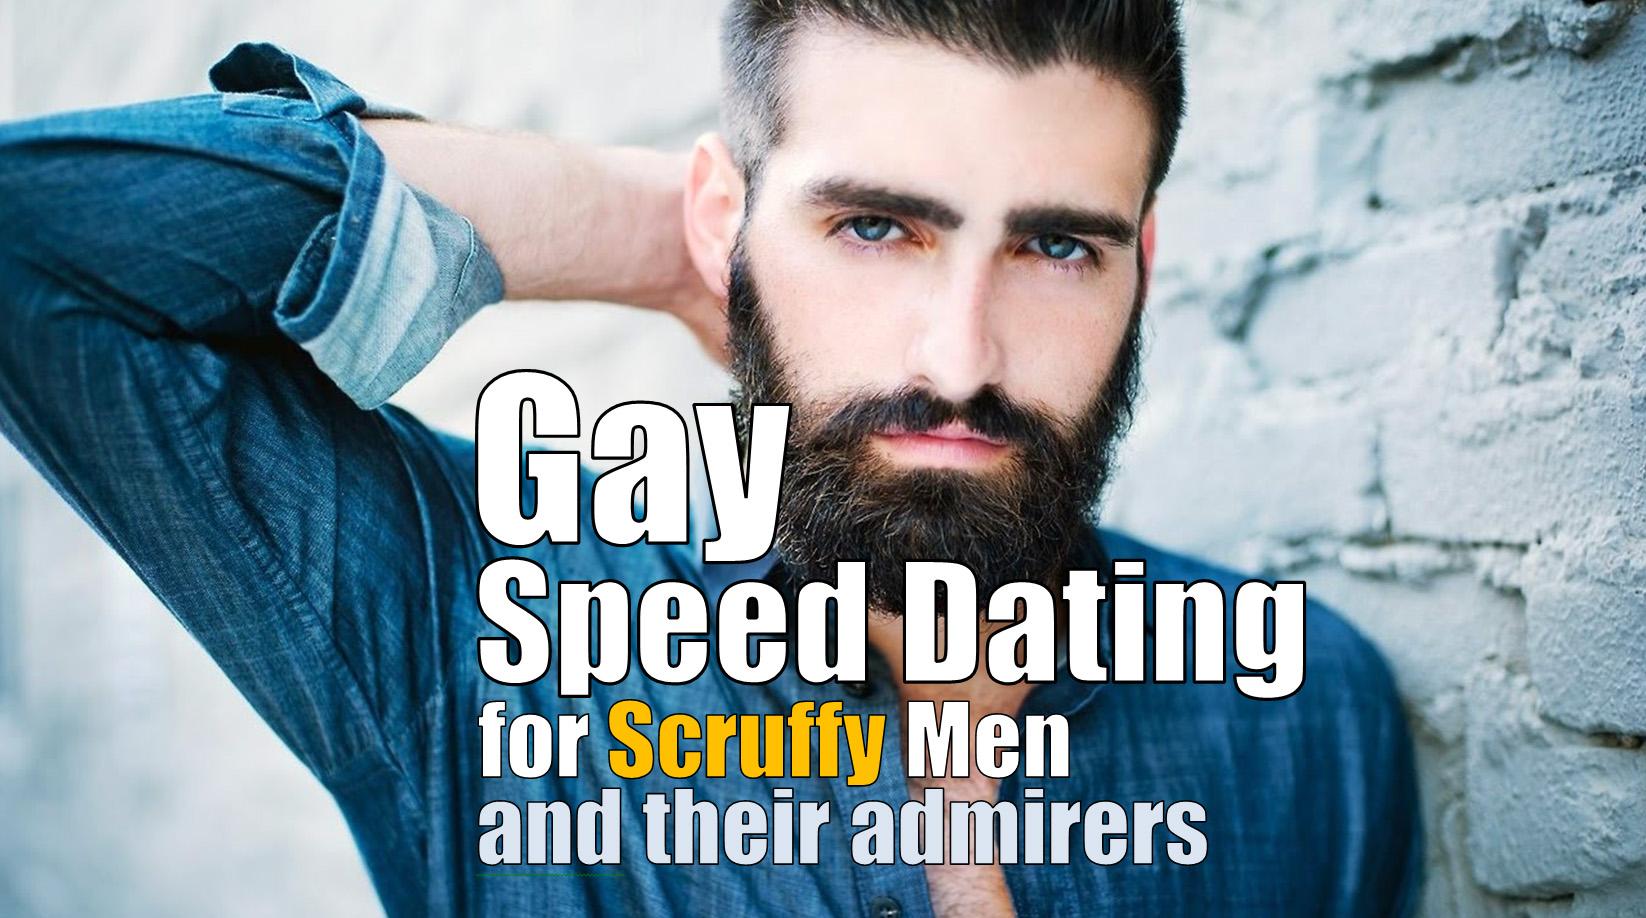 Gay dating city in mattoon illinois